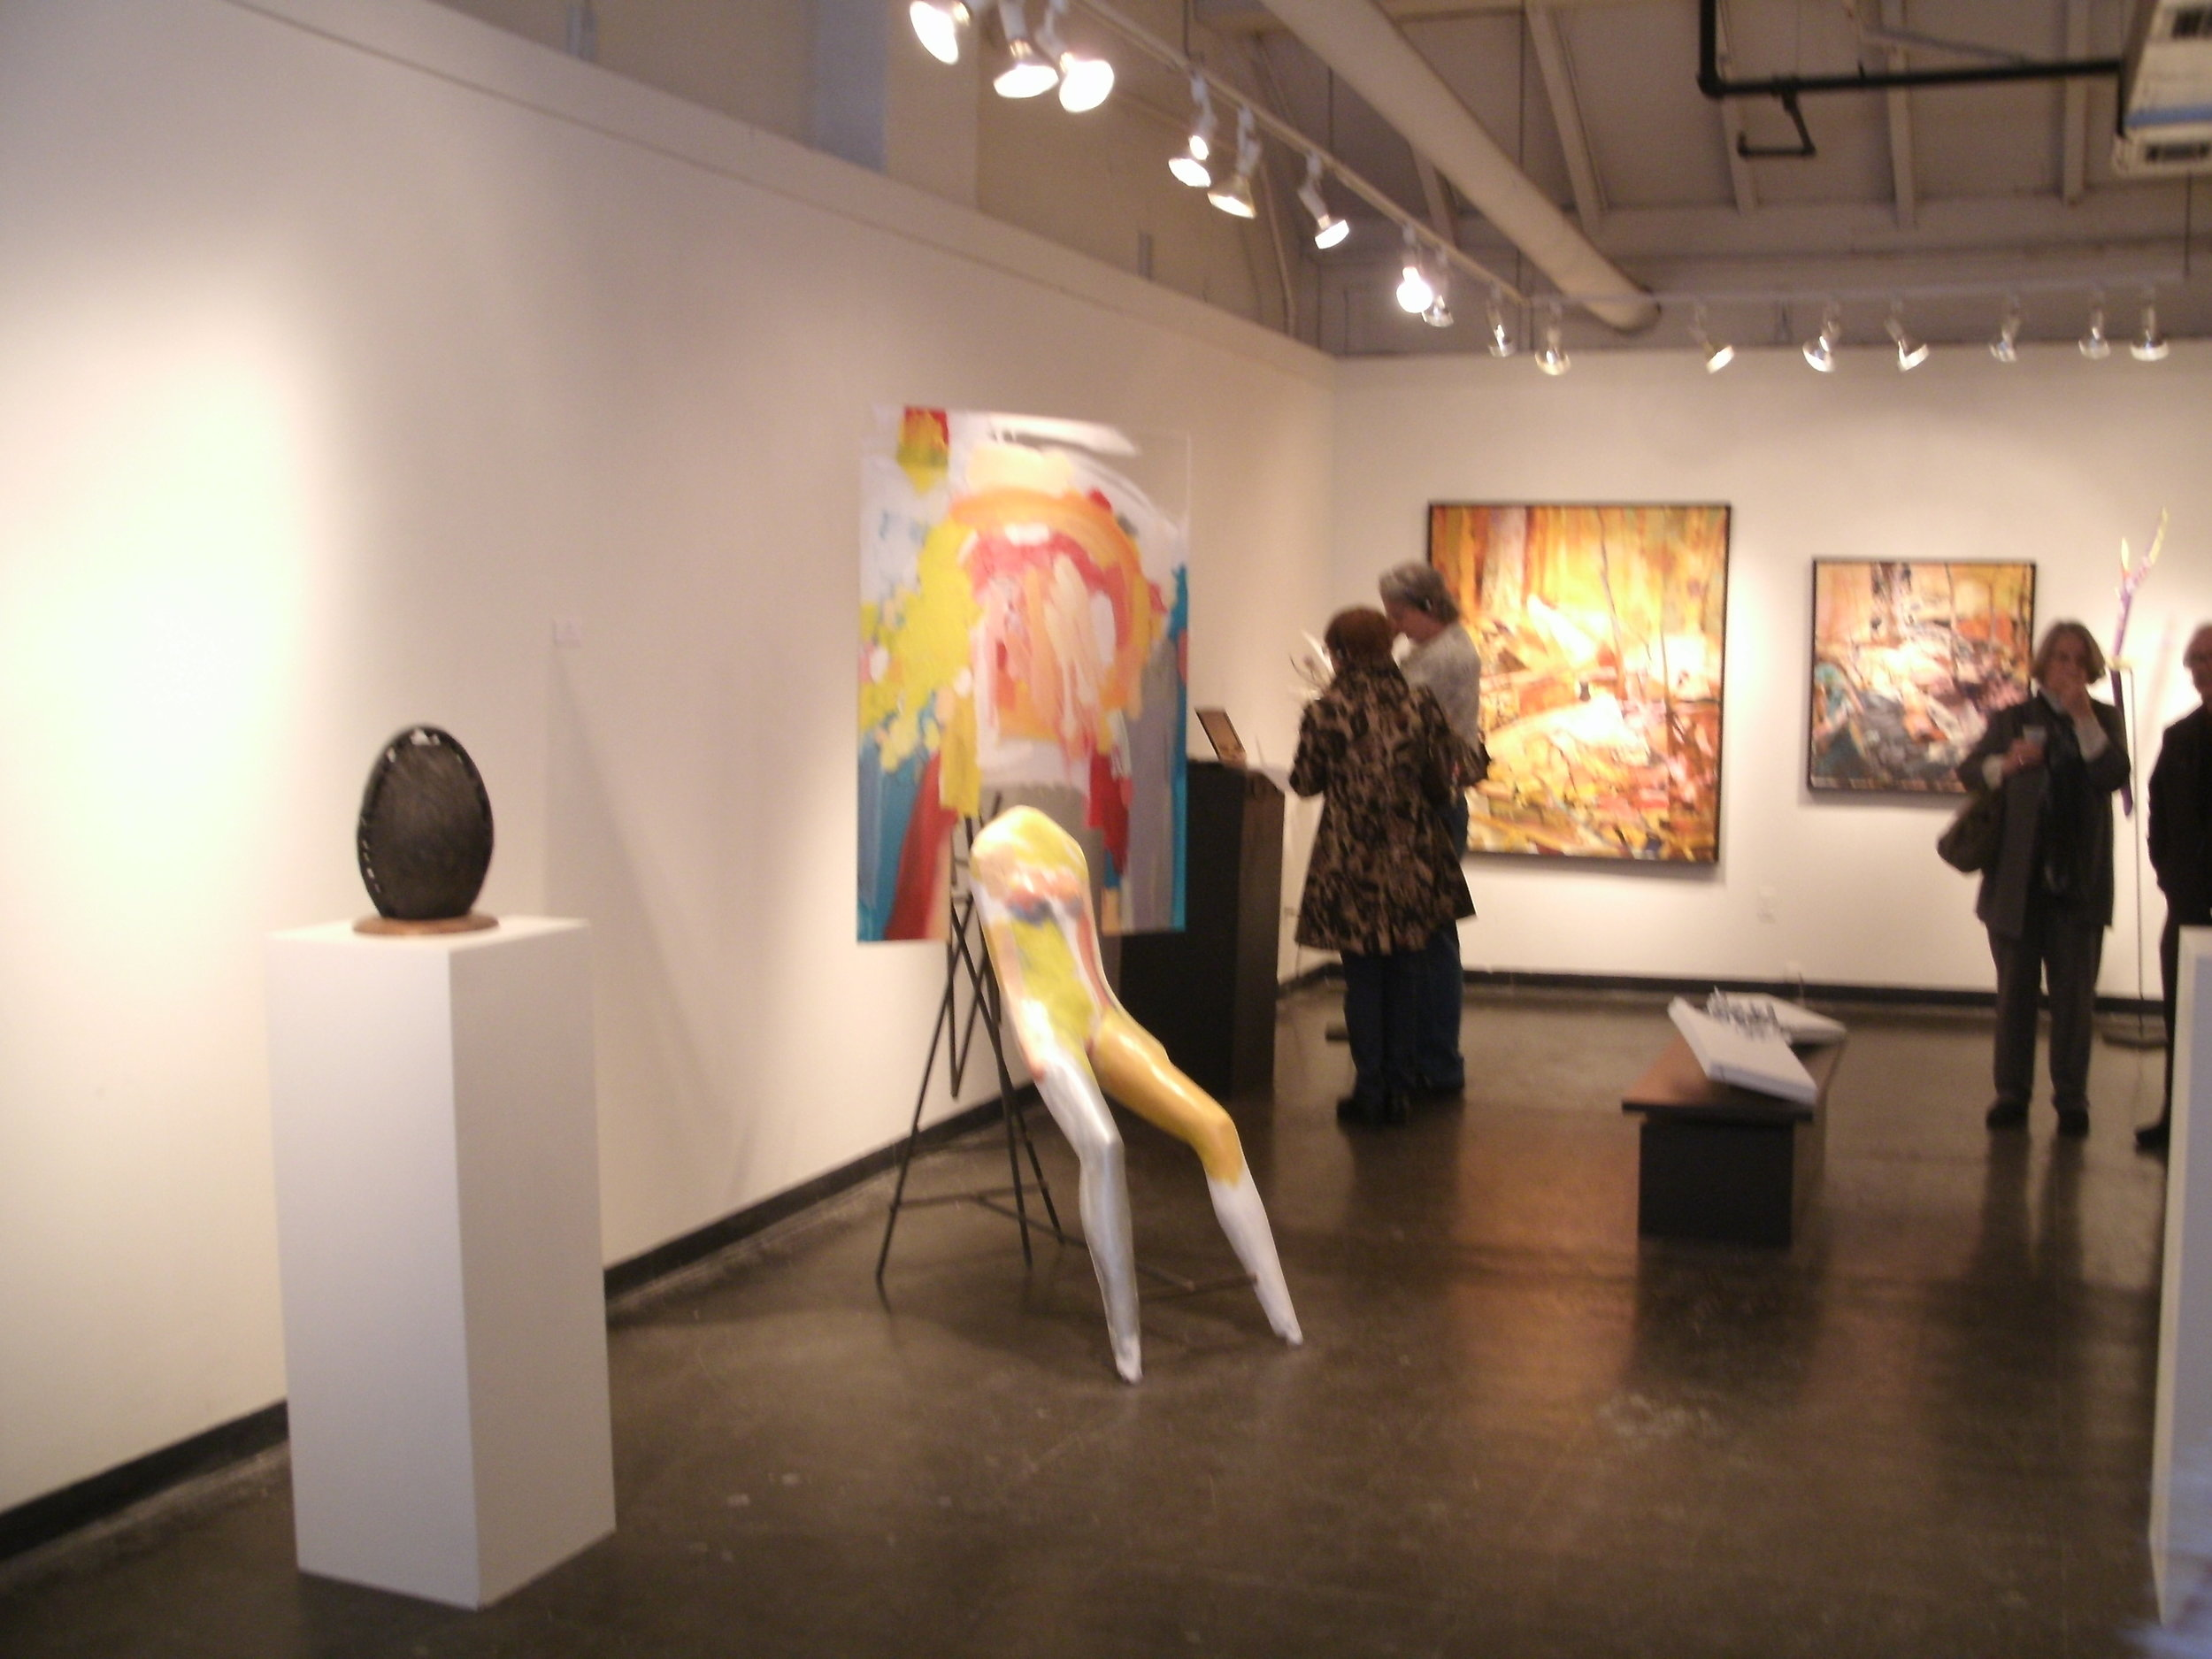 Seated Figure, 3rd St. Gallery, Phila.